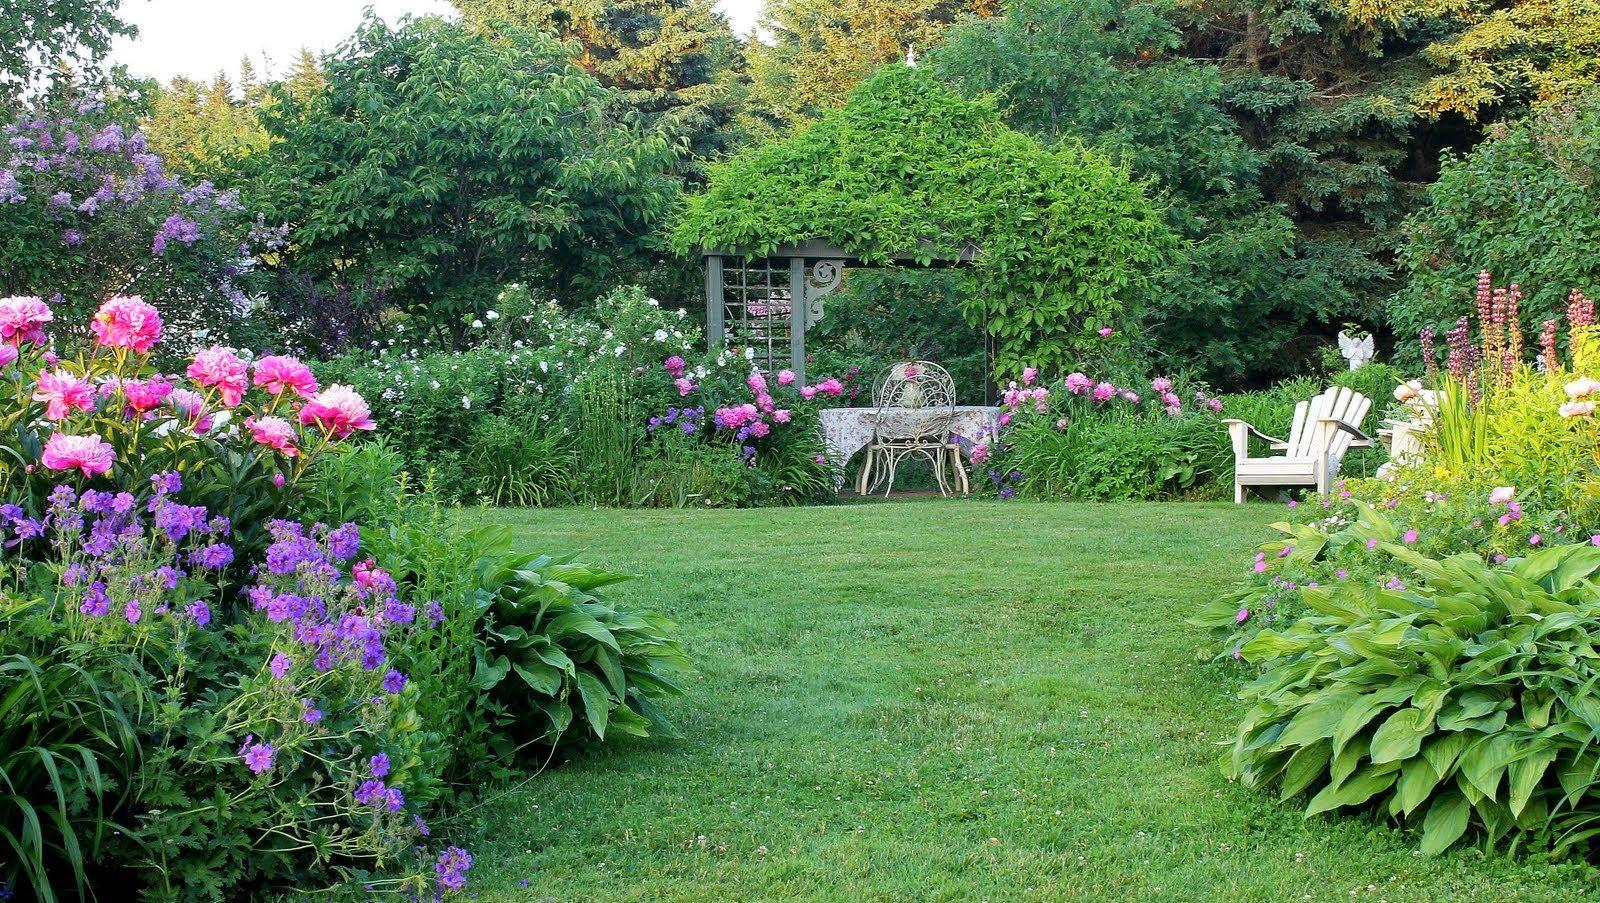 Aiken House \u0026 Gardens: In an English Country Garden | G ...